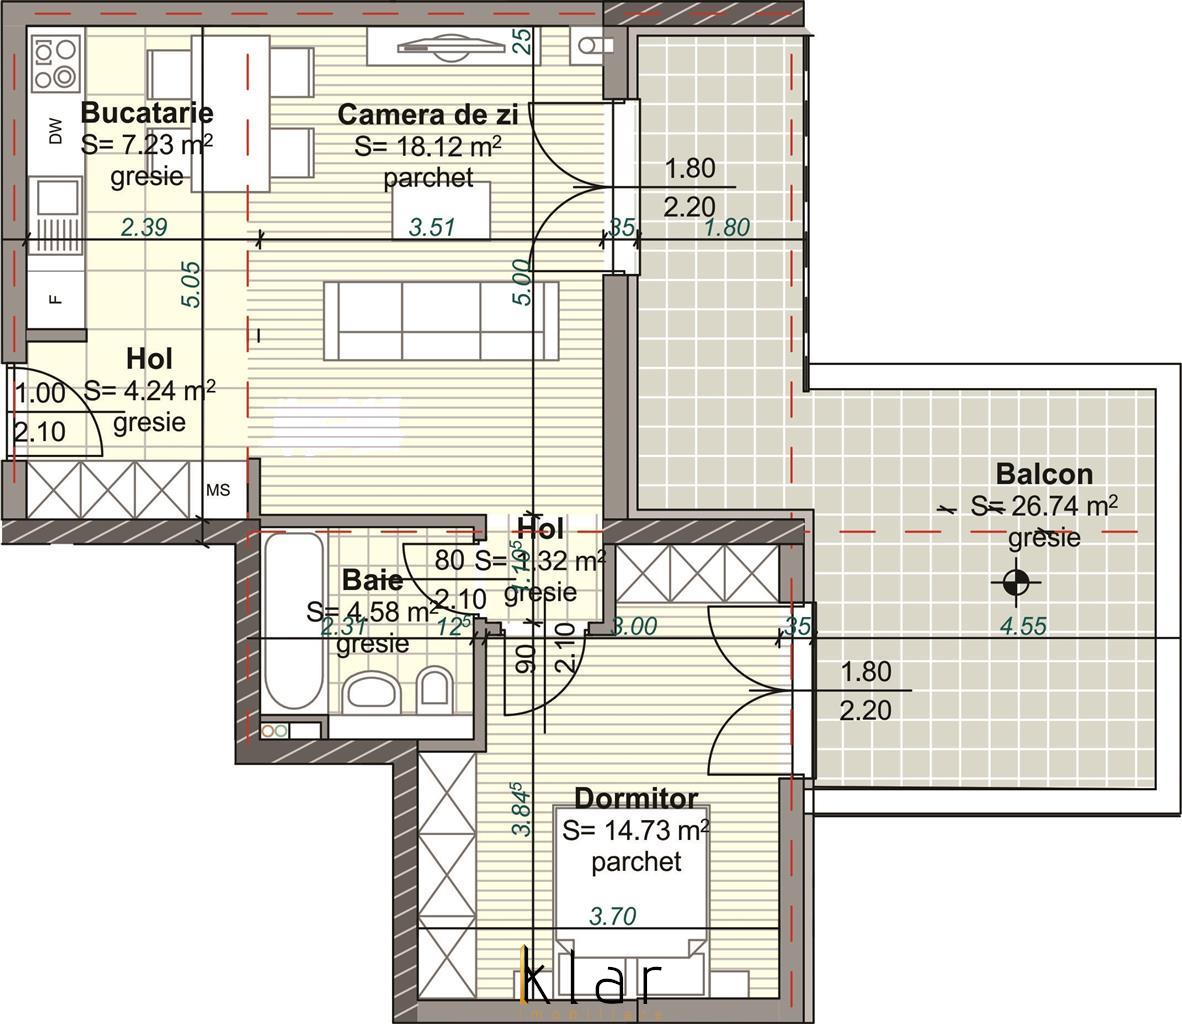 Vanzare apartament cu 2 camere la 5 minute de Piata Mihai Viteazu